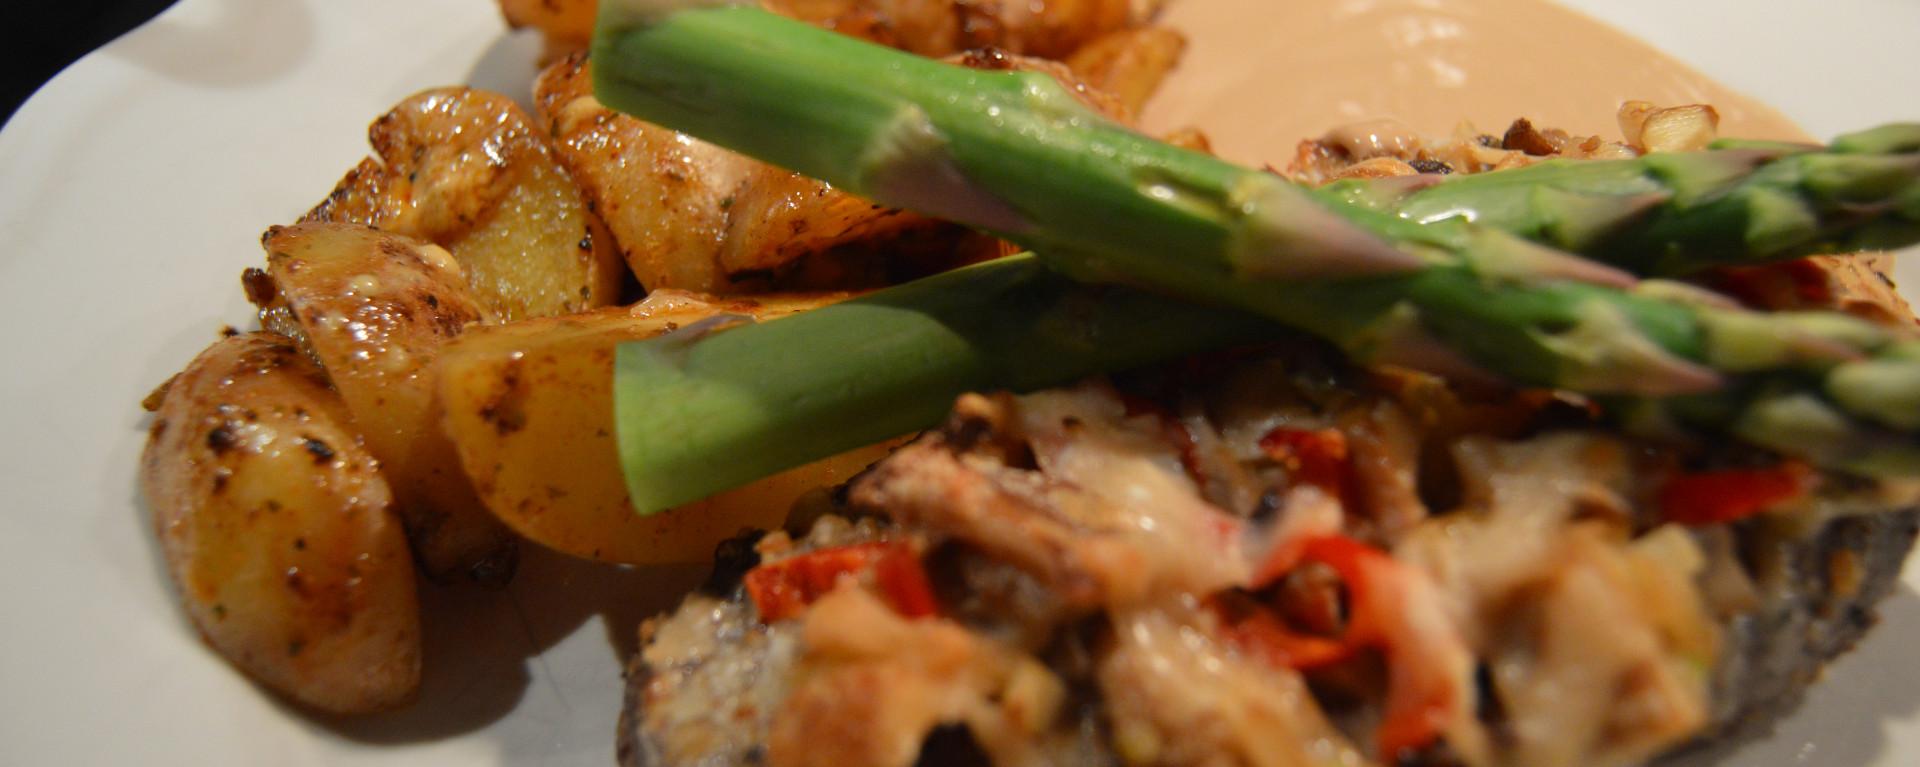 ChefNorway's Steak with Mushrooms